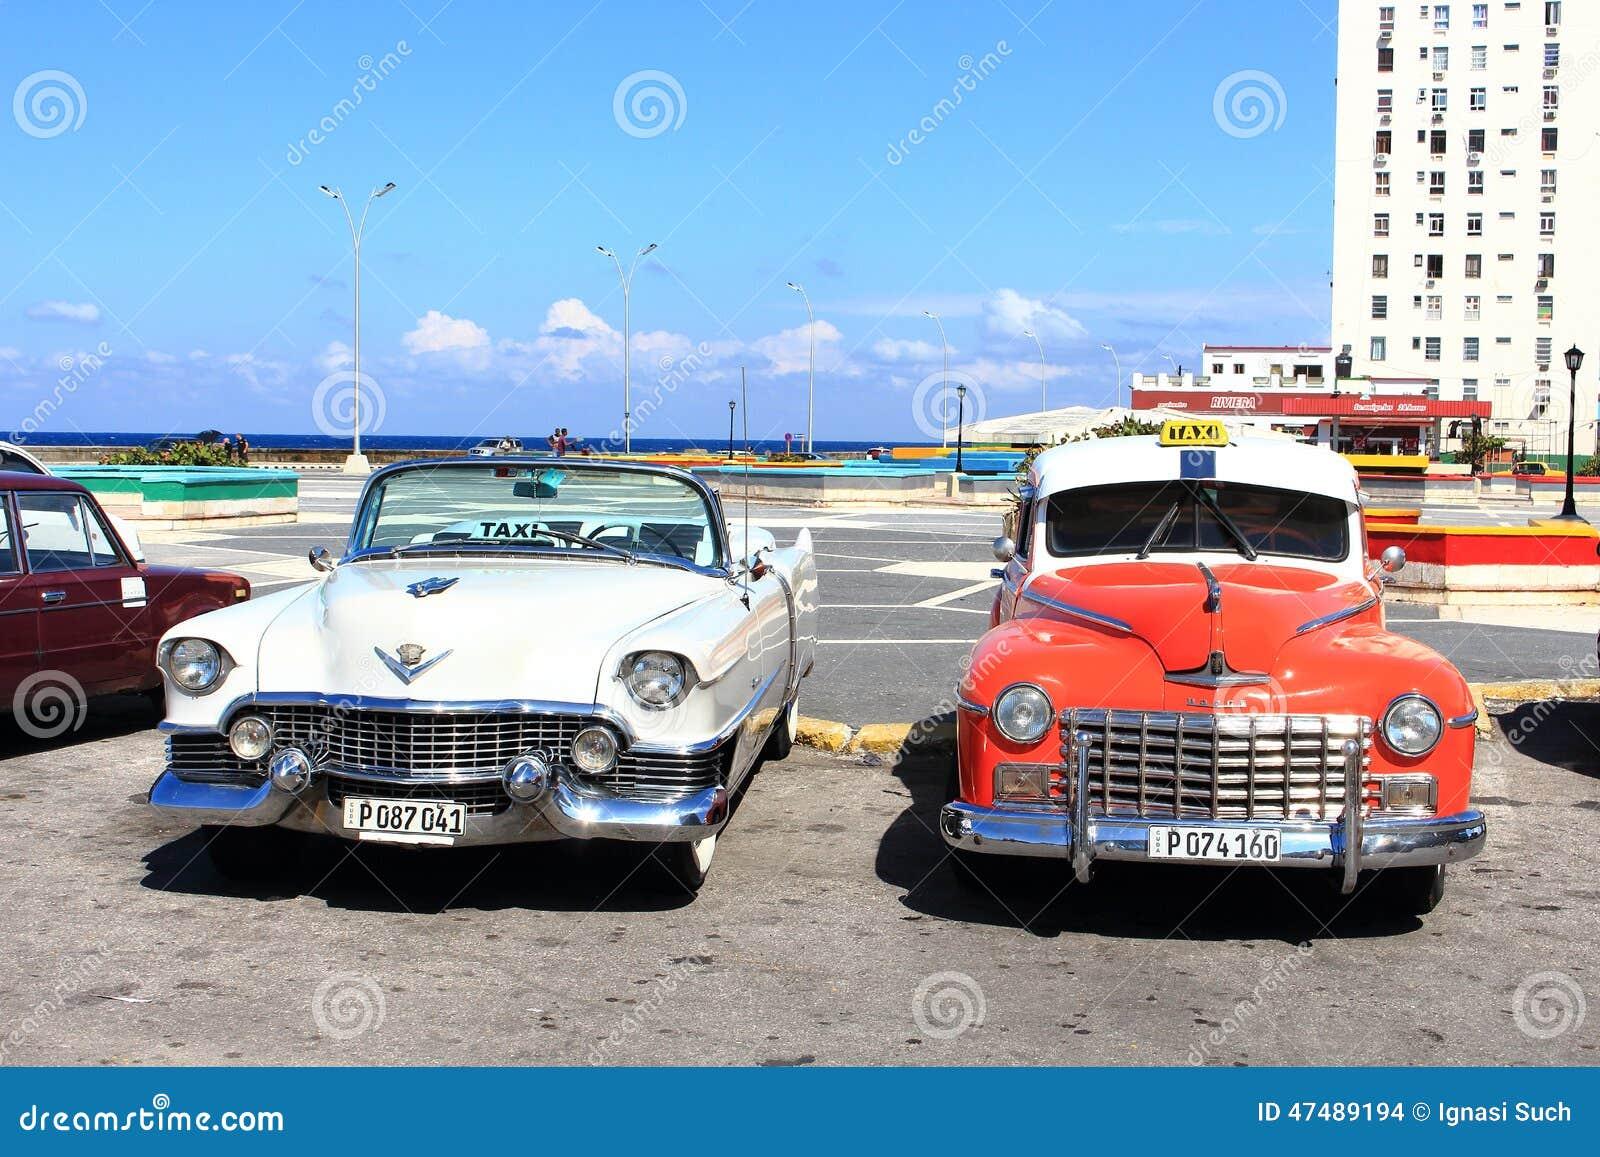 la habana cuba november 14th of 2014 old american cars provide taxi service to tourist all. Black Bedroom Furniture Sets. Home Design Ideas